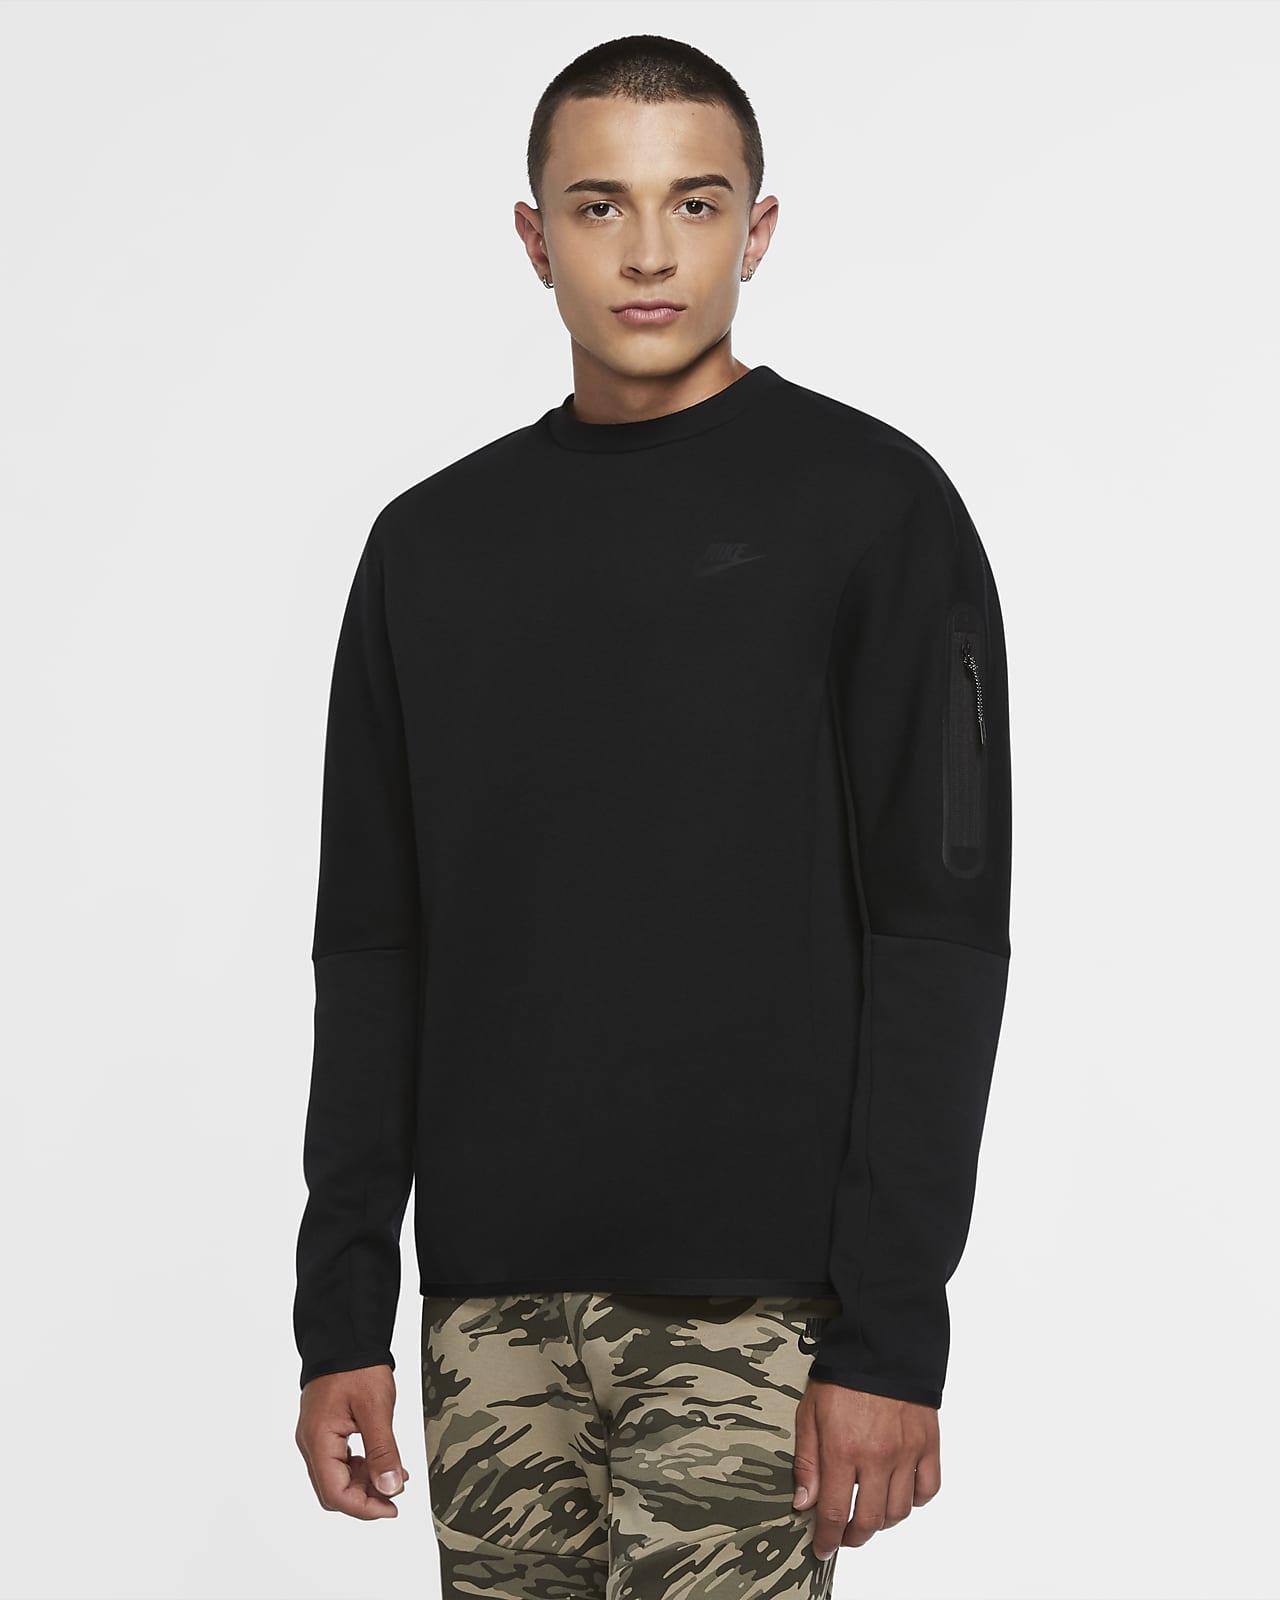 Nike Sportswear Tech Fleece Herren-Rundhalsshirt